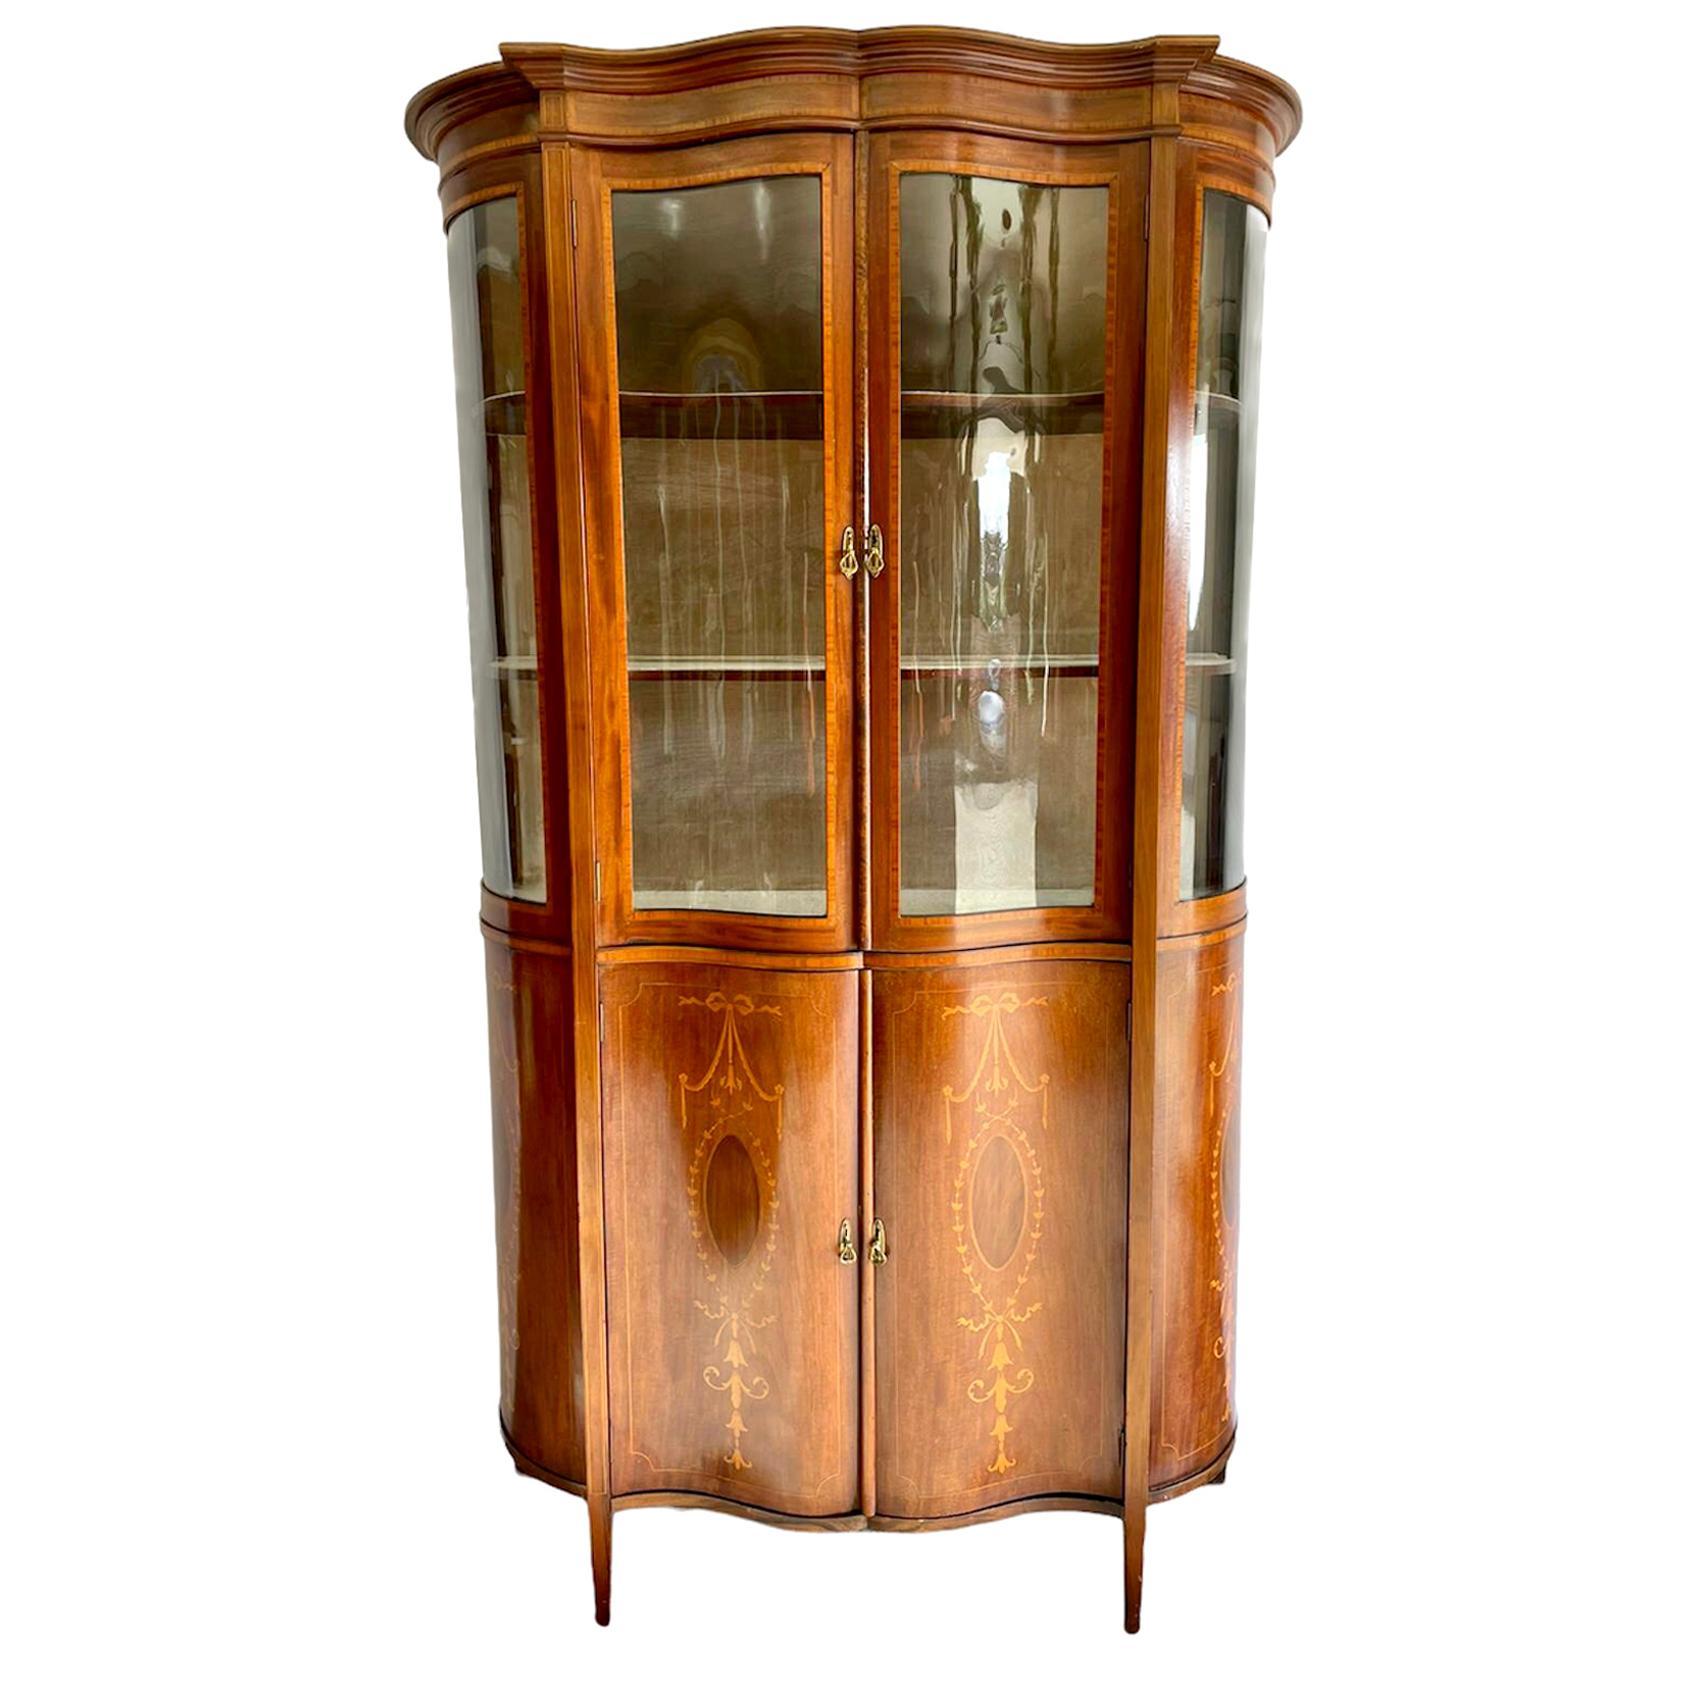 19th Century Victorian Mahogany Inlaid Serpentine Shaped Display Cabinet